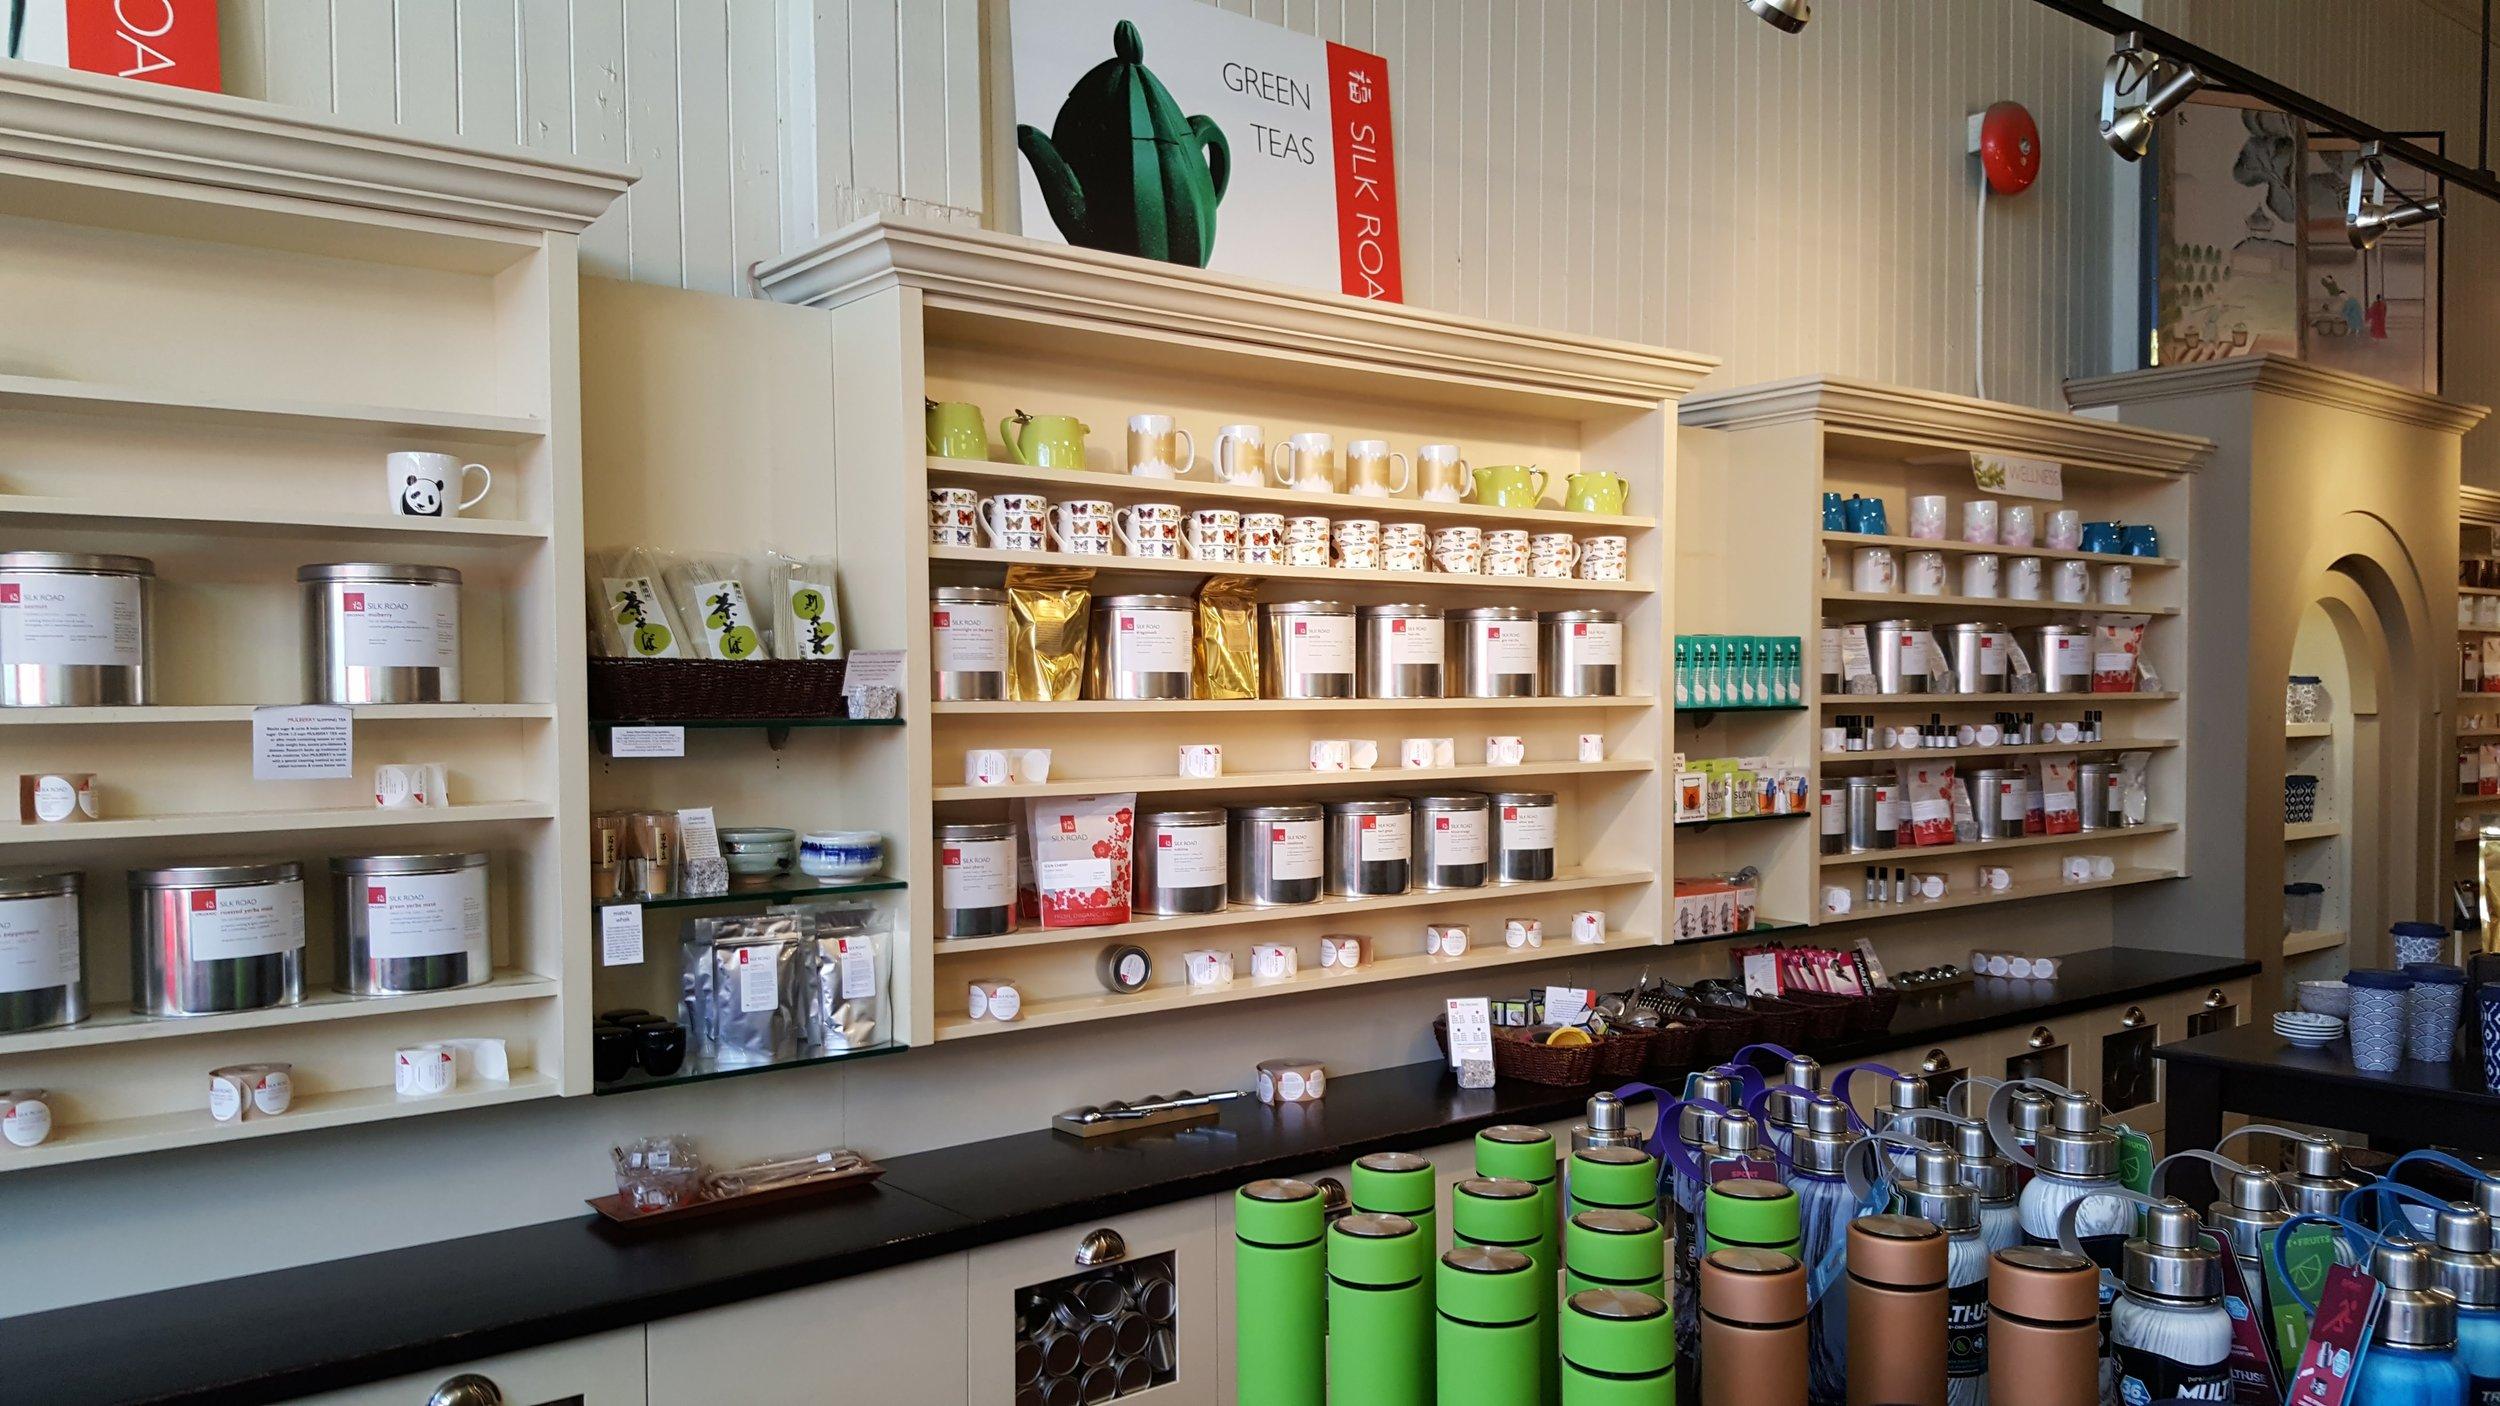 Silk Road Teas - not just teas!